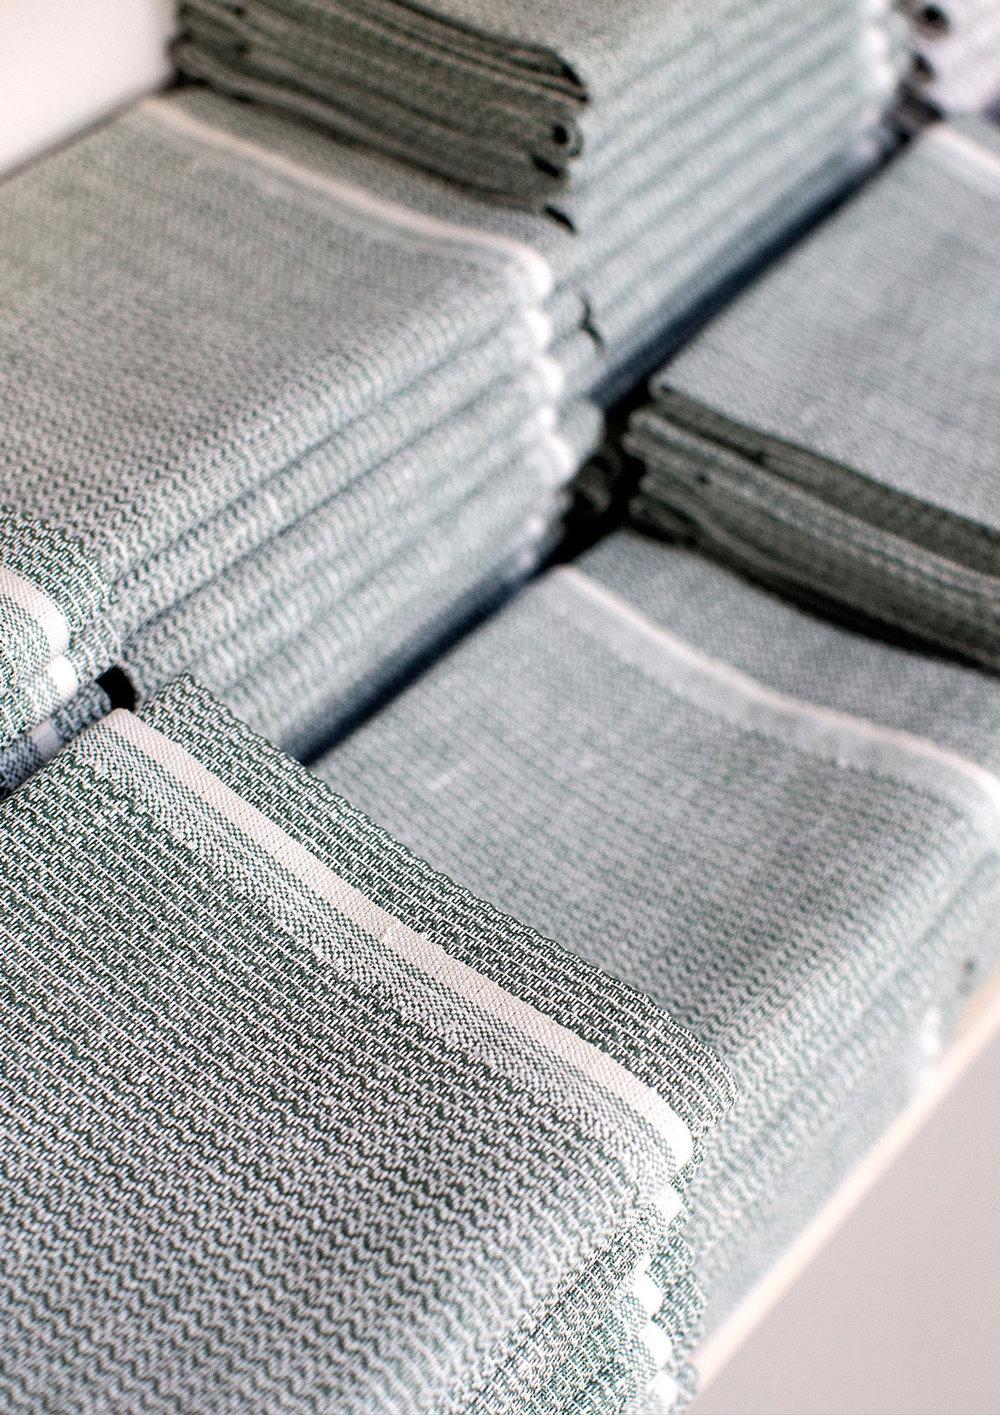 Natural linen - Karin Carlander textiles - Masters of Linen